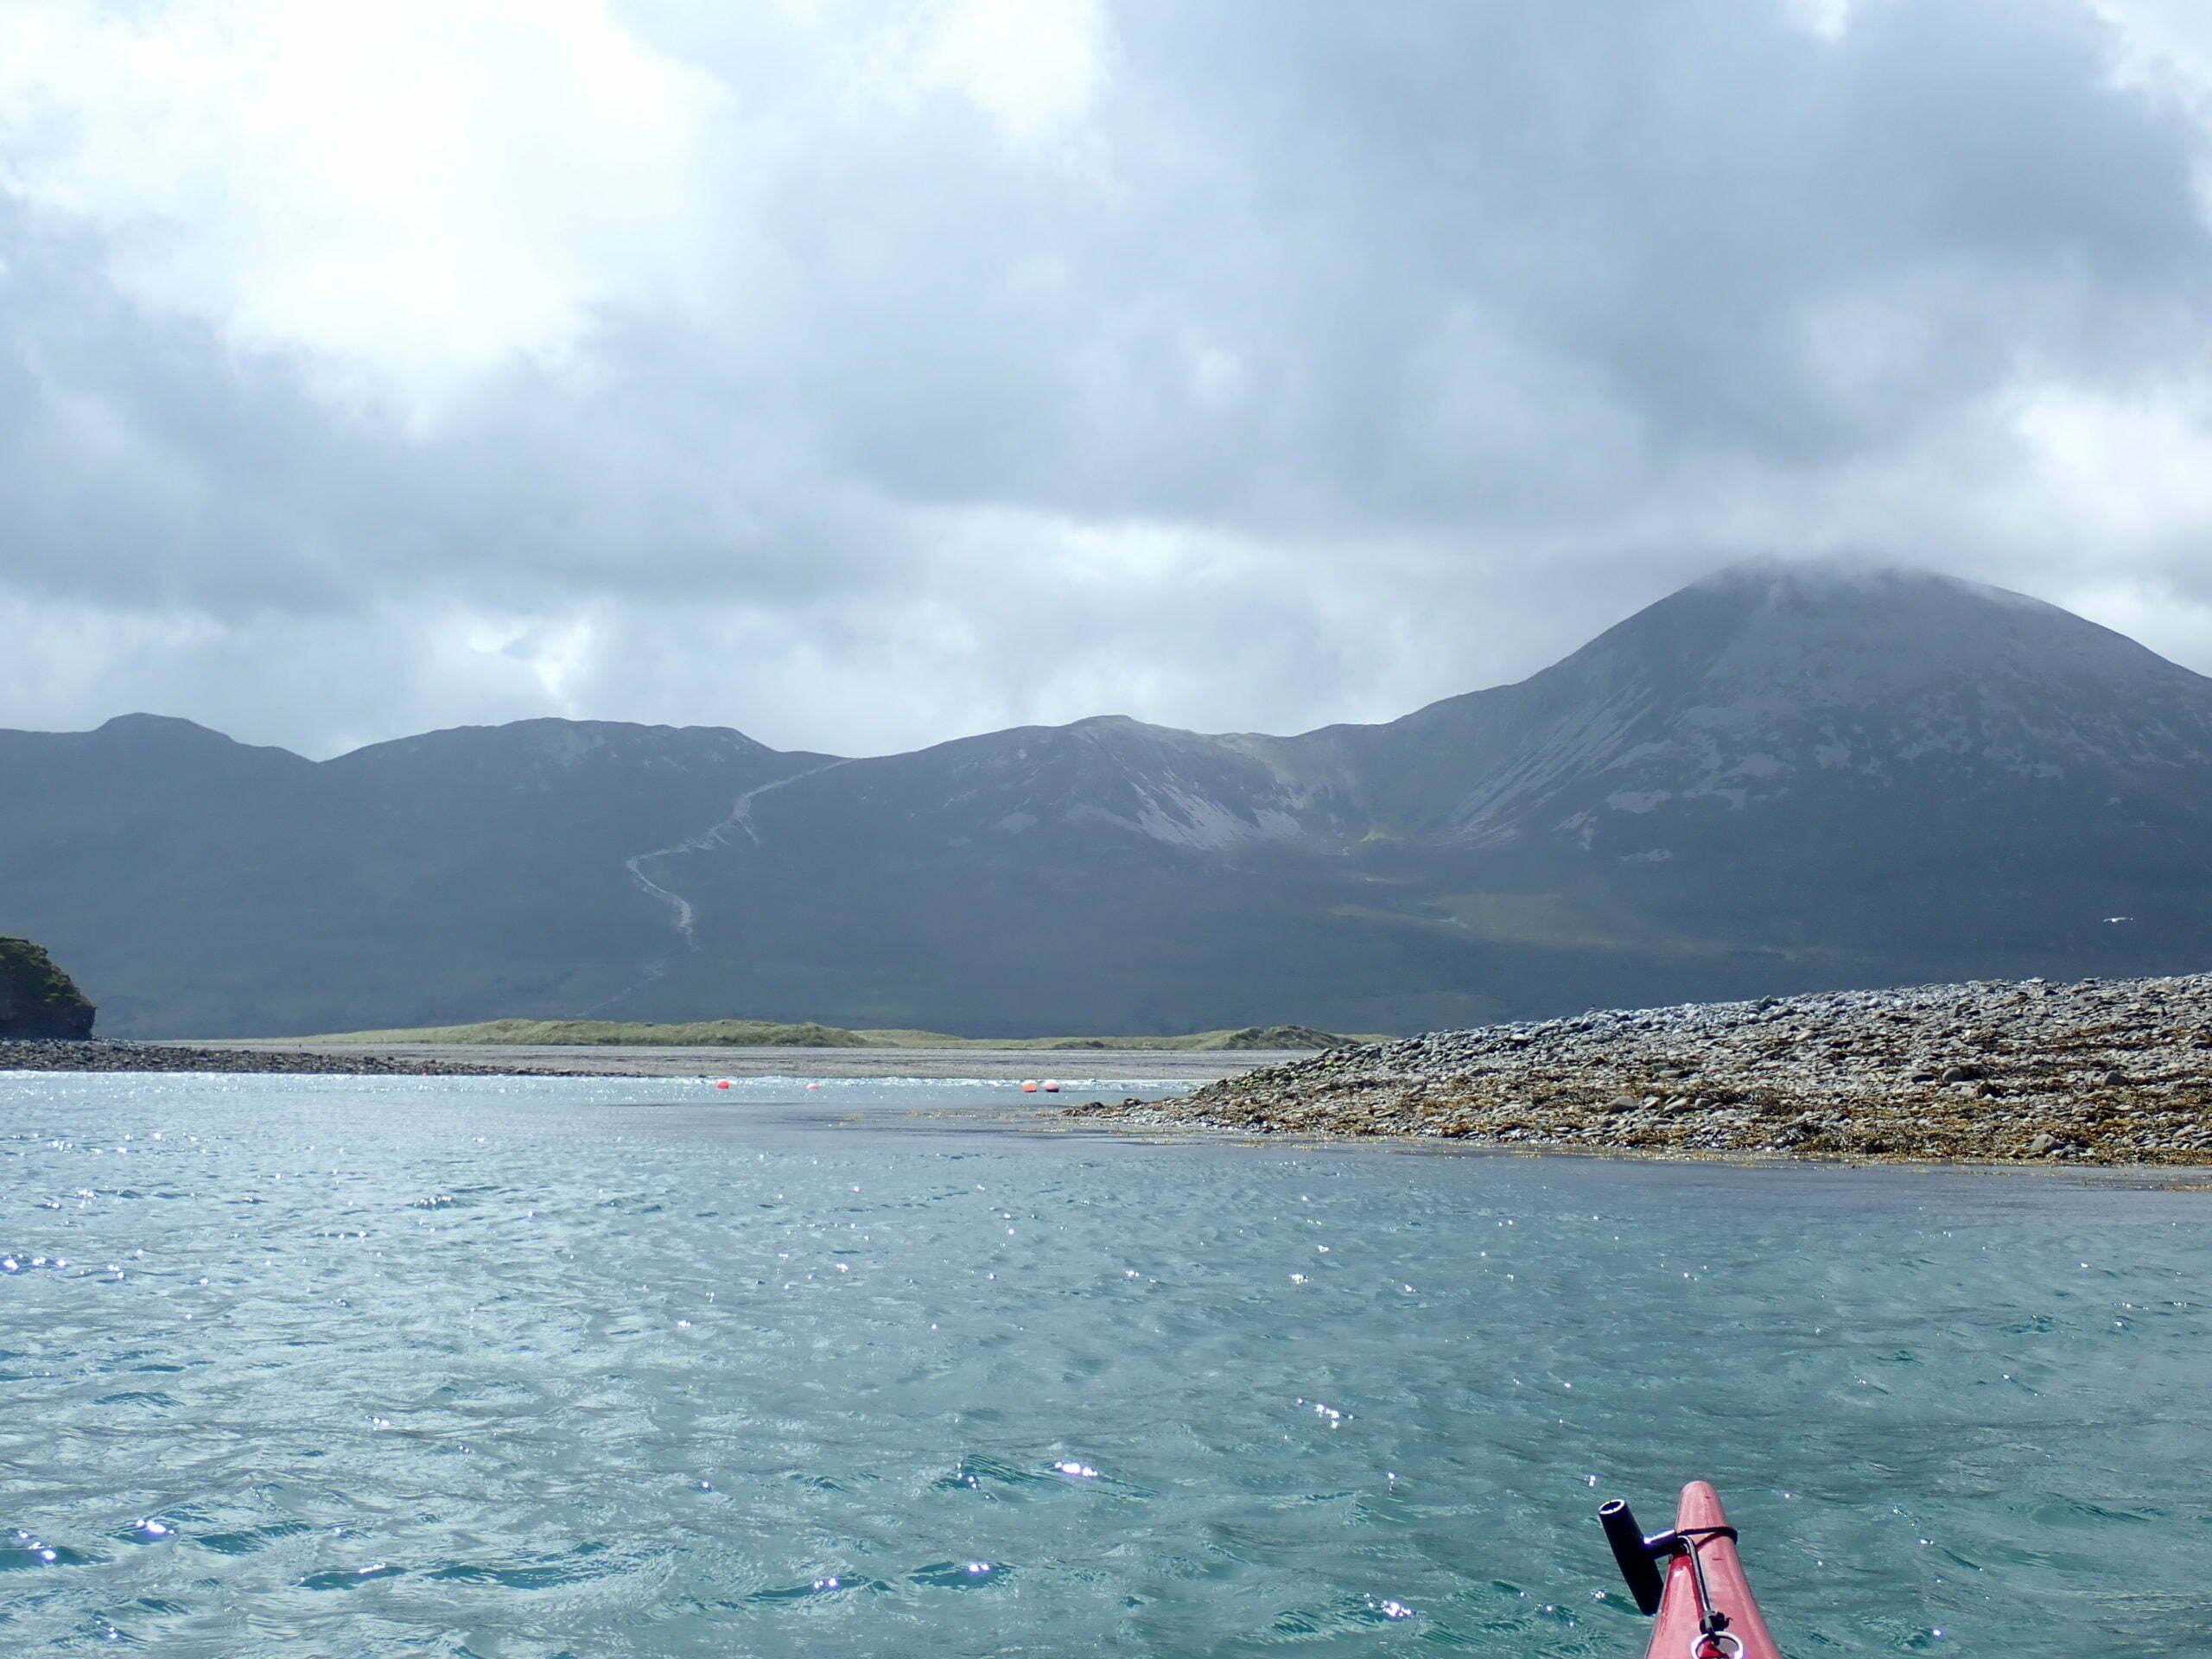 Seascape County Mayo